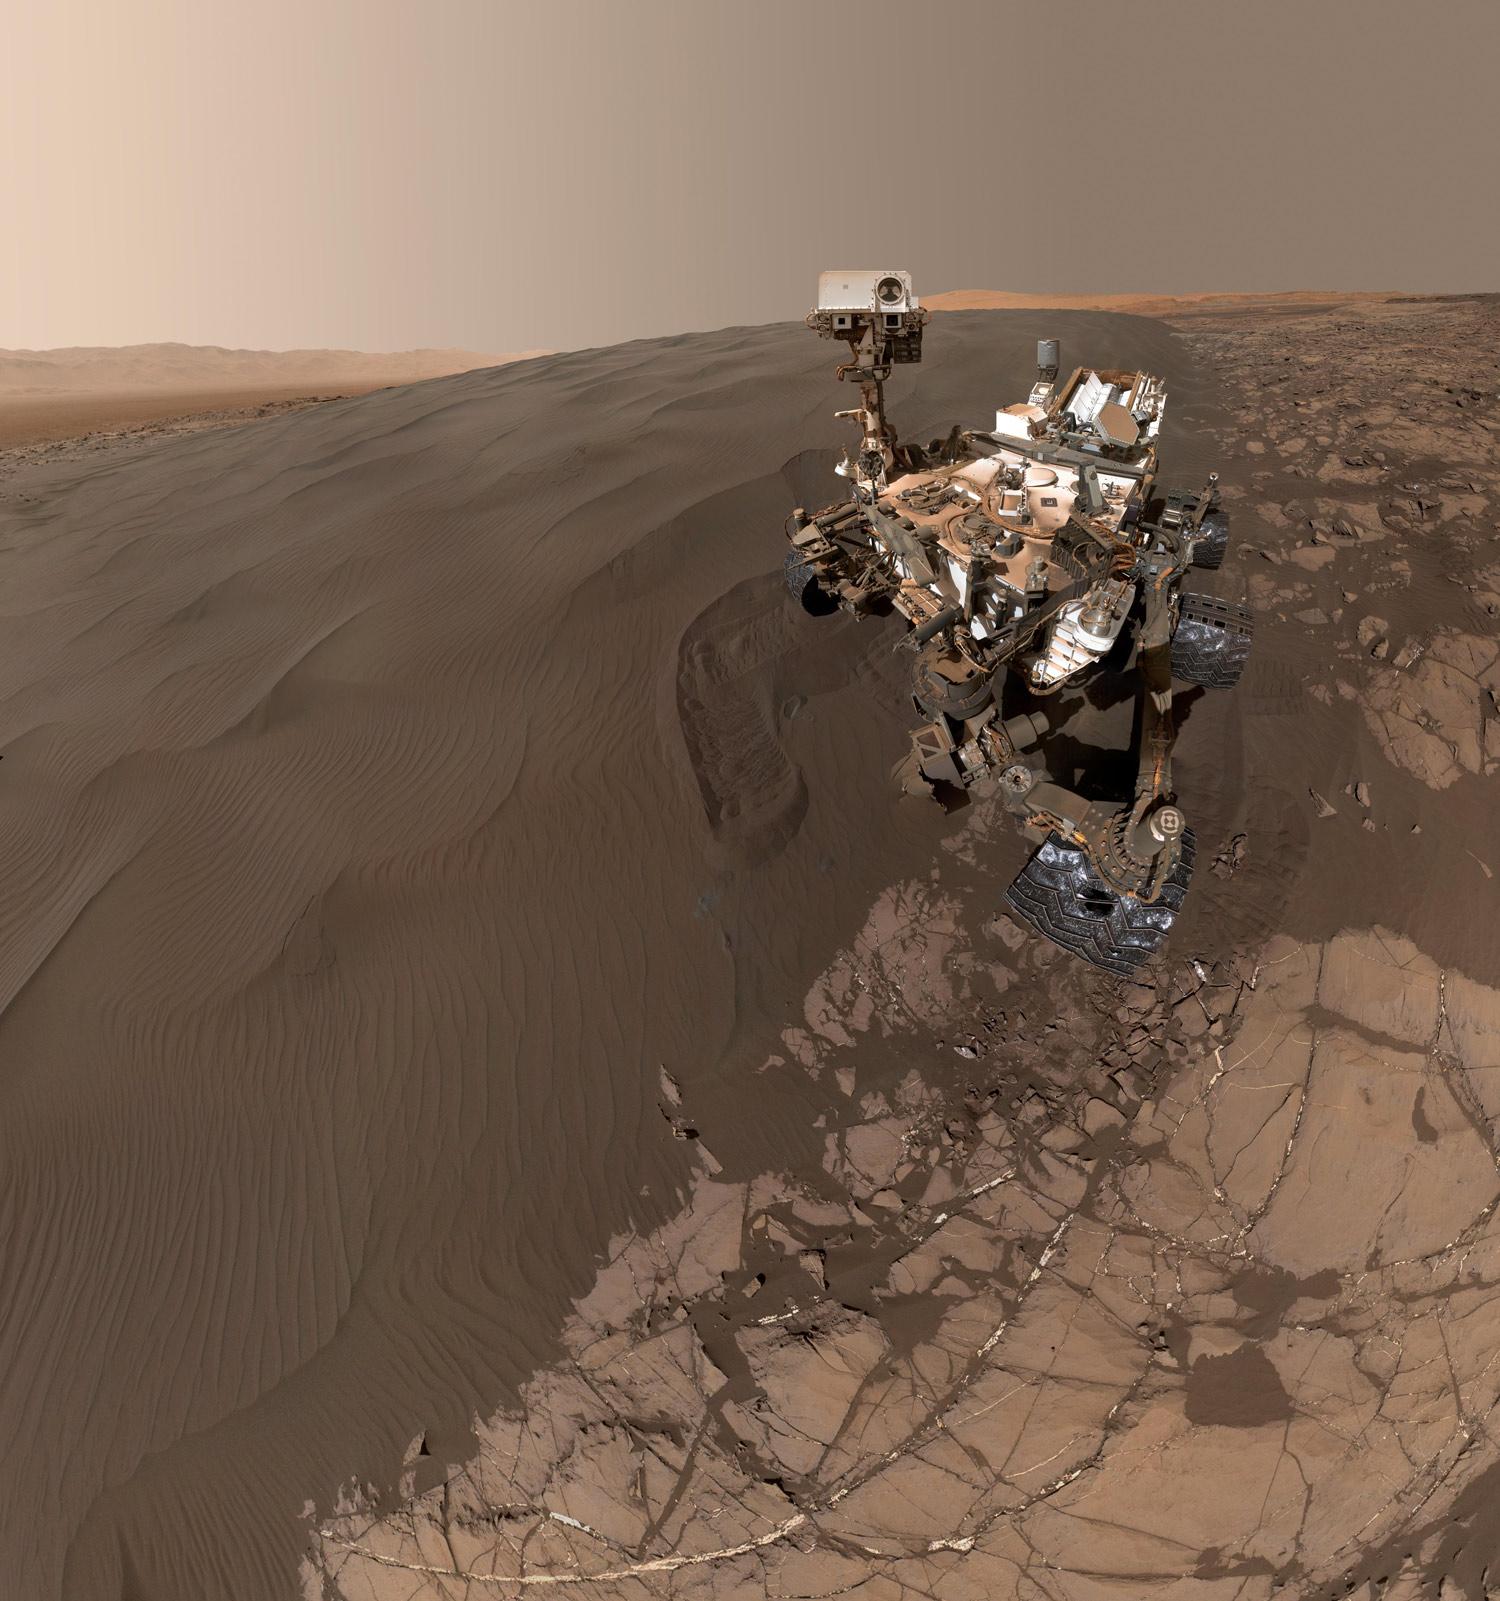 curiosity_dunes.jpg.CROP.original-original